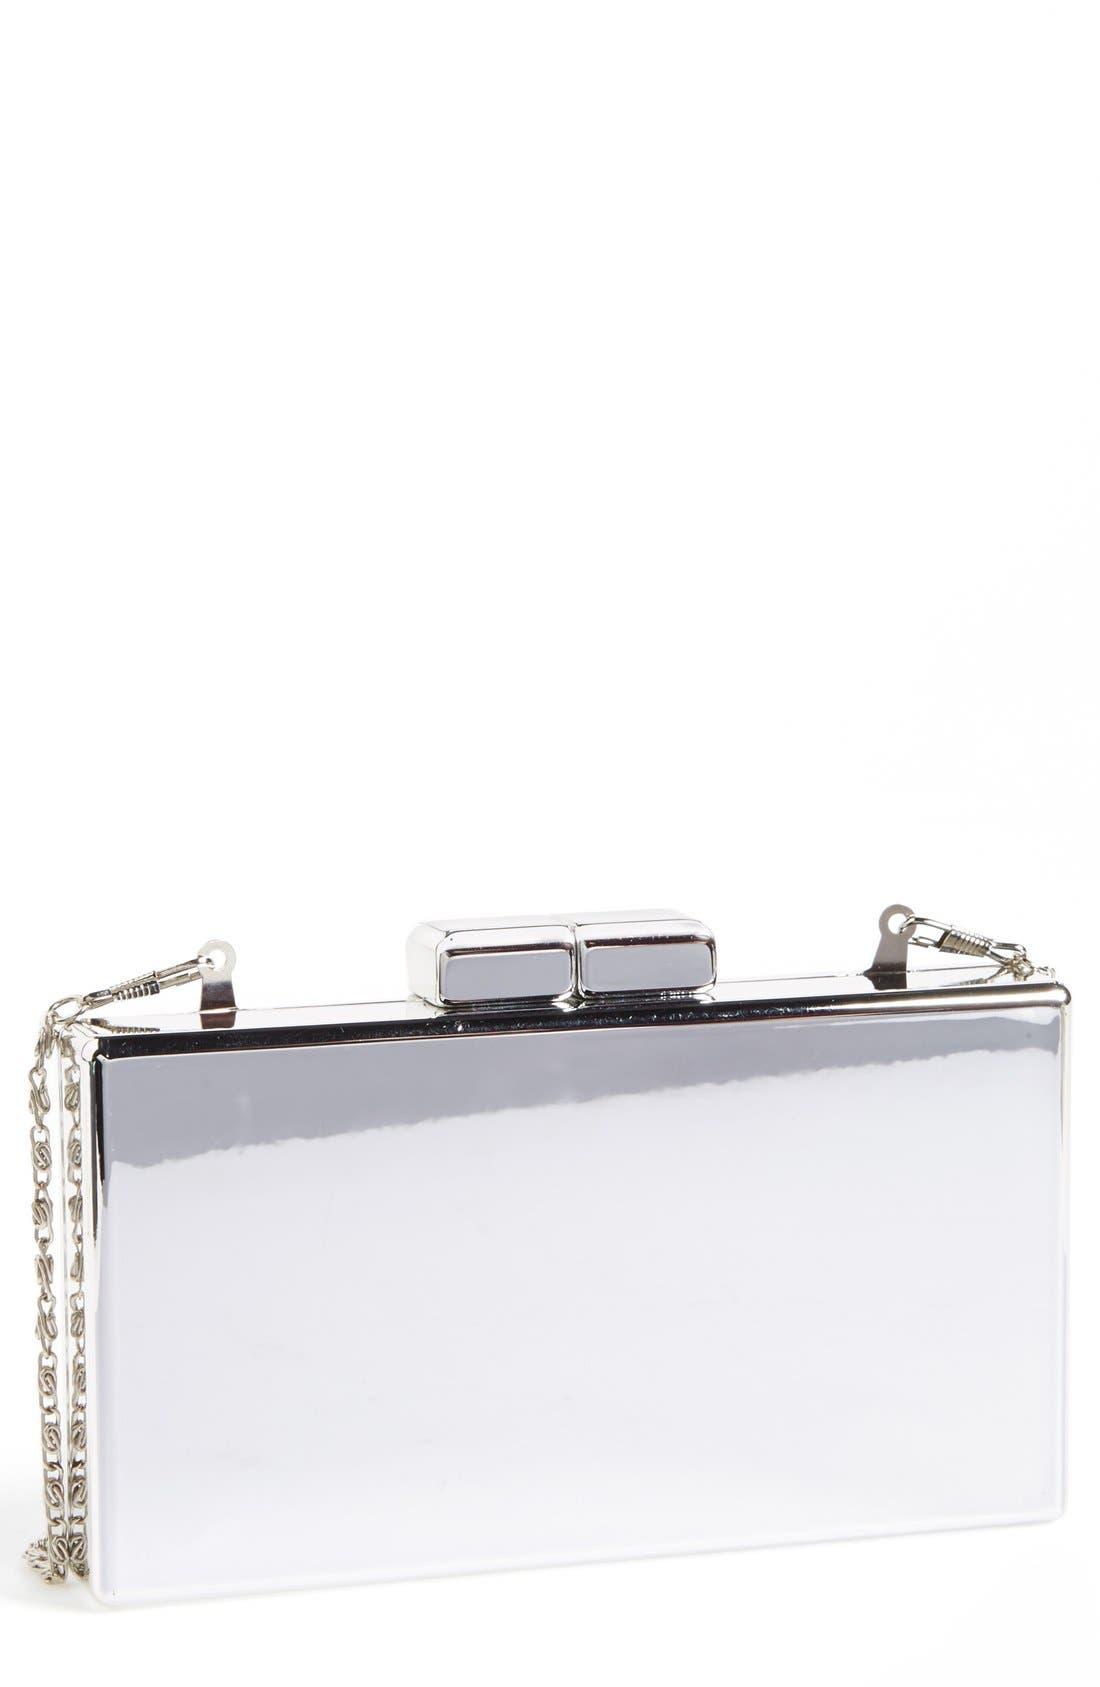 ZZDNU NATASHA COUTURE Natasha Couture 'Metallic Mirror' Box Clutch, Main, color, 040